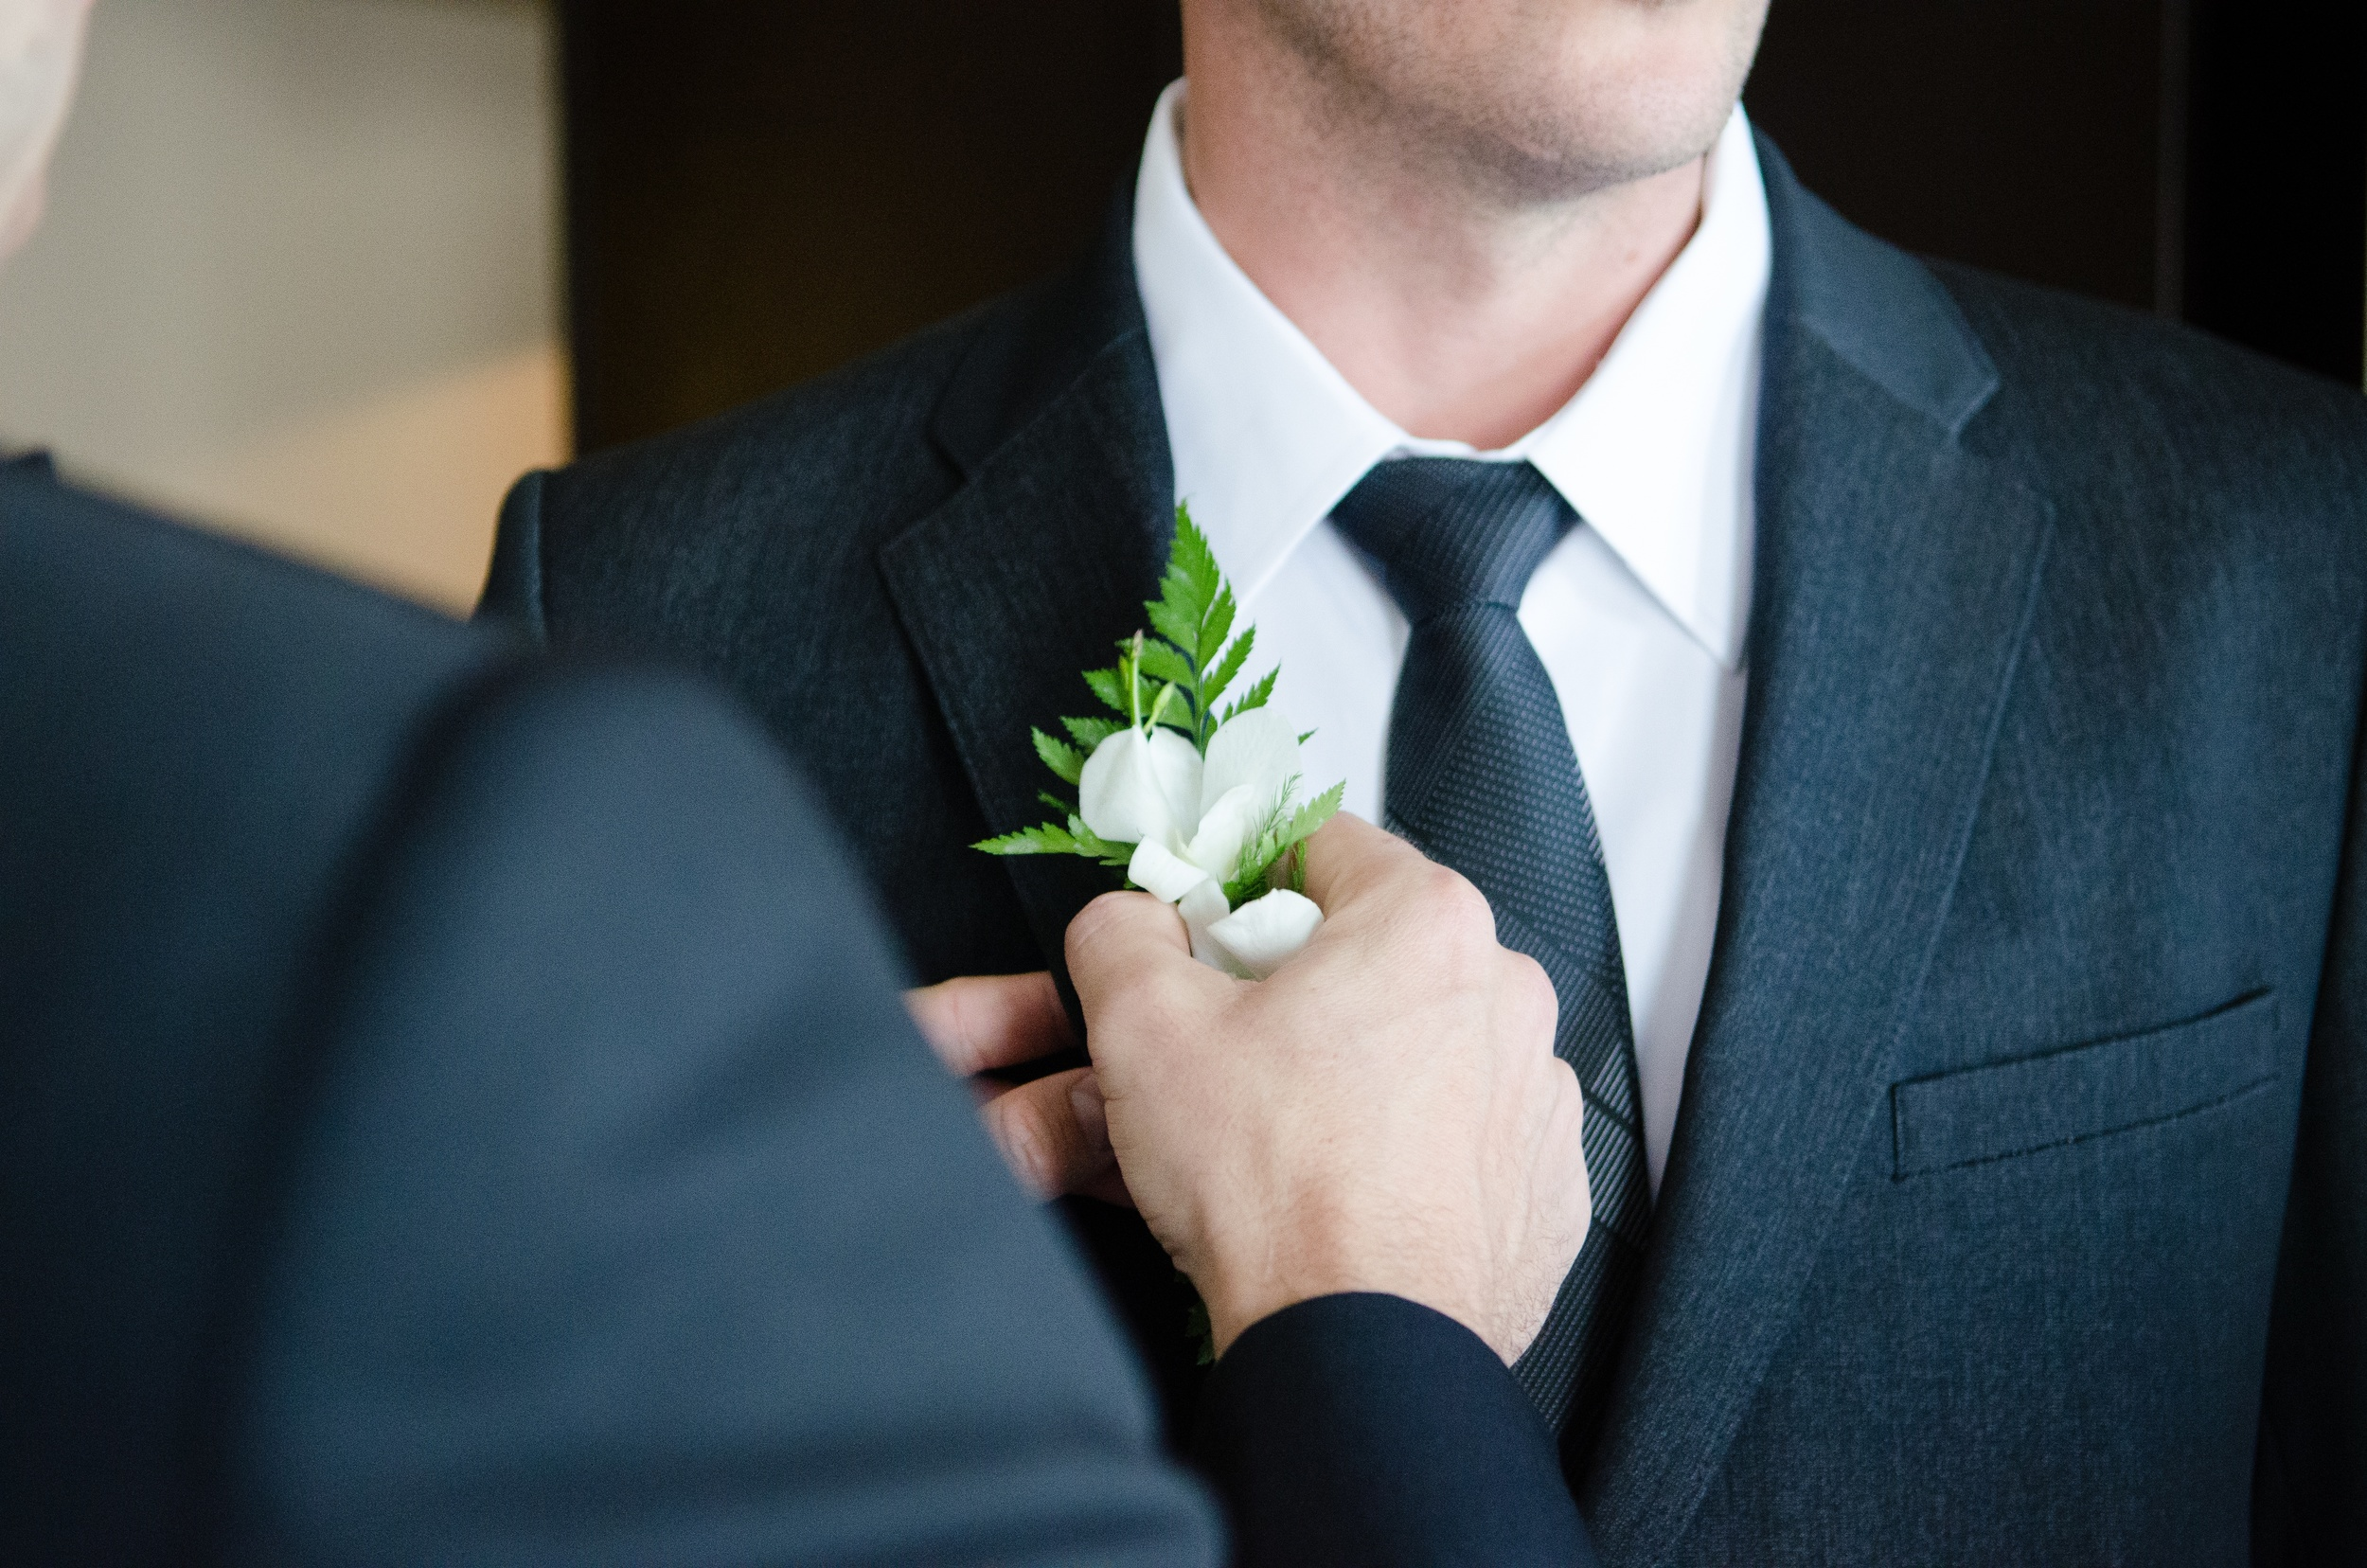 mens wedding suit flower pocket chalfont st peter menswear